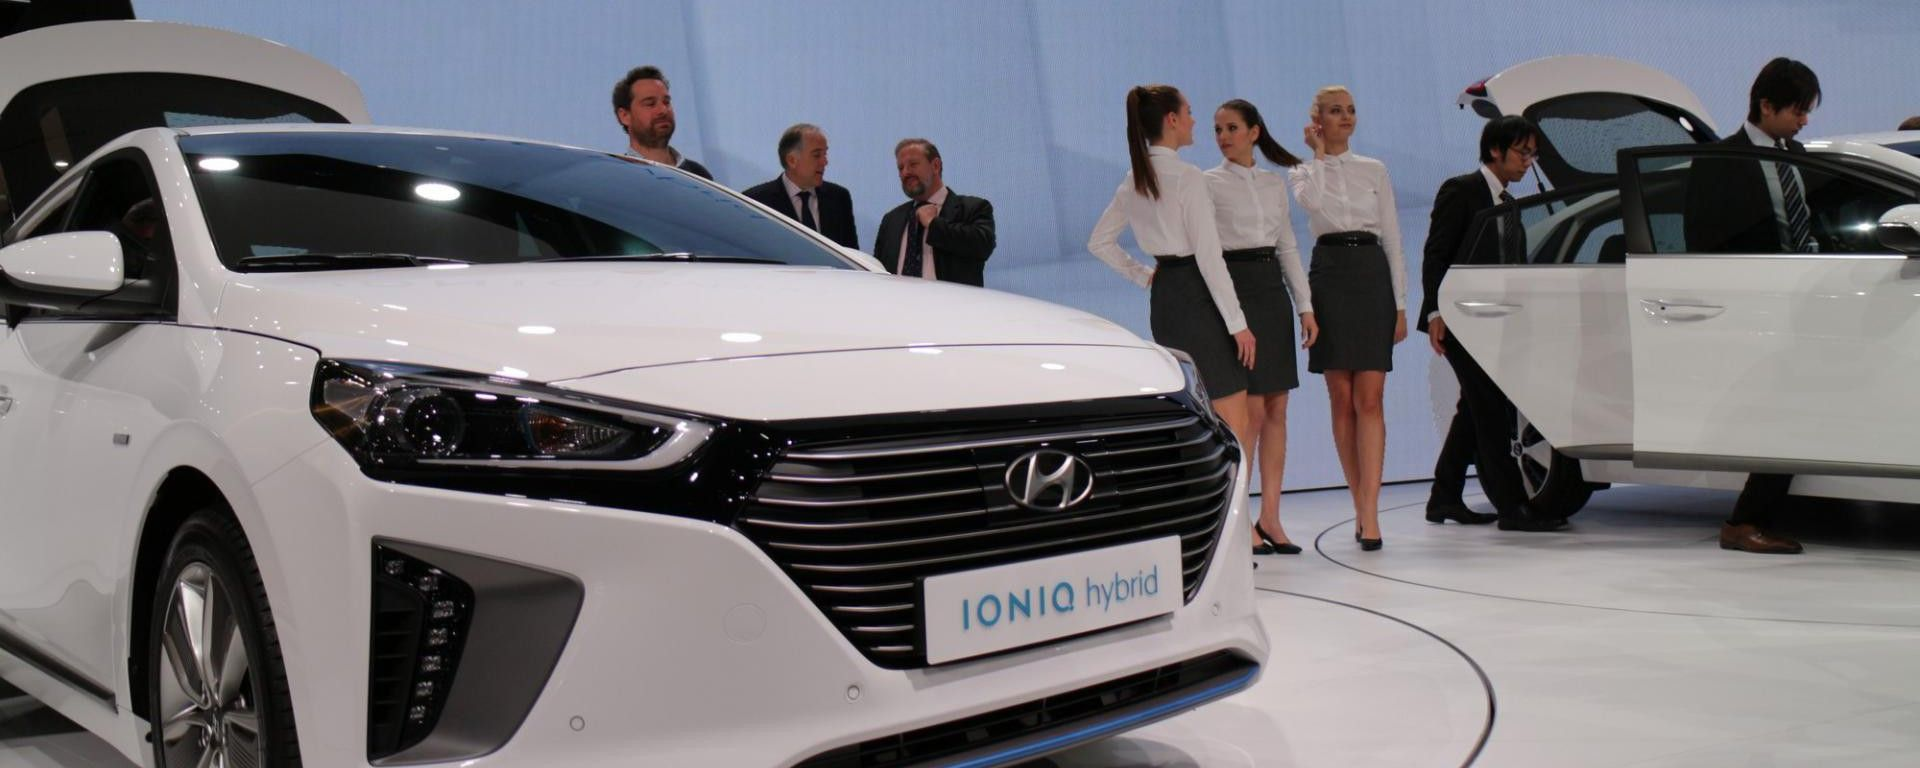 Ginevra 2016: la Hyundai Ioniq